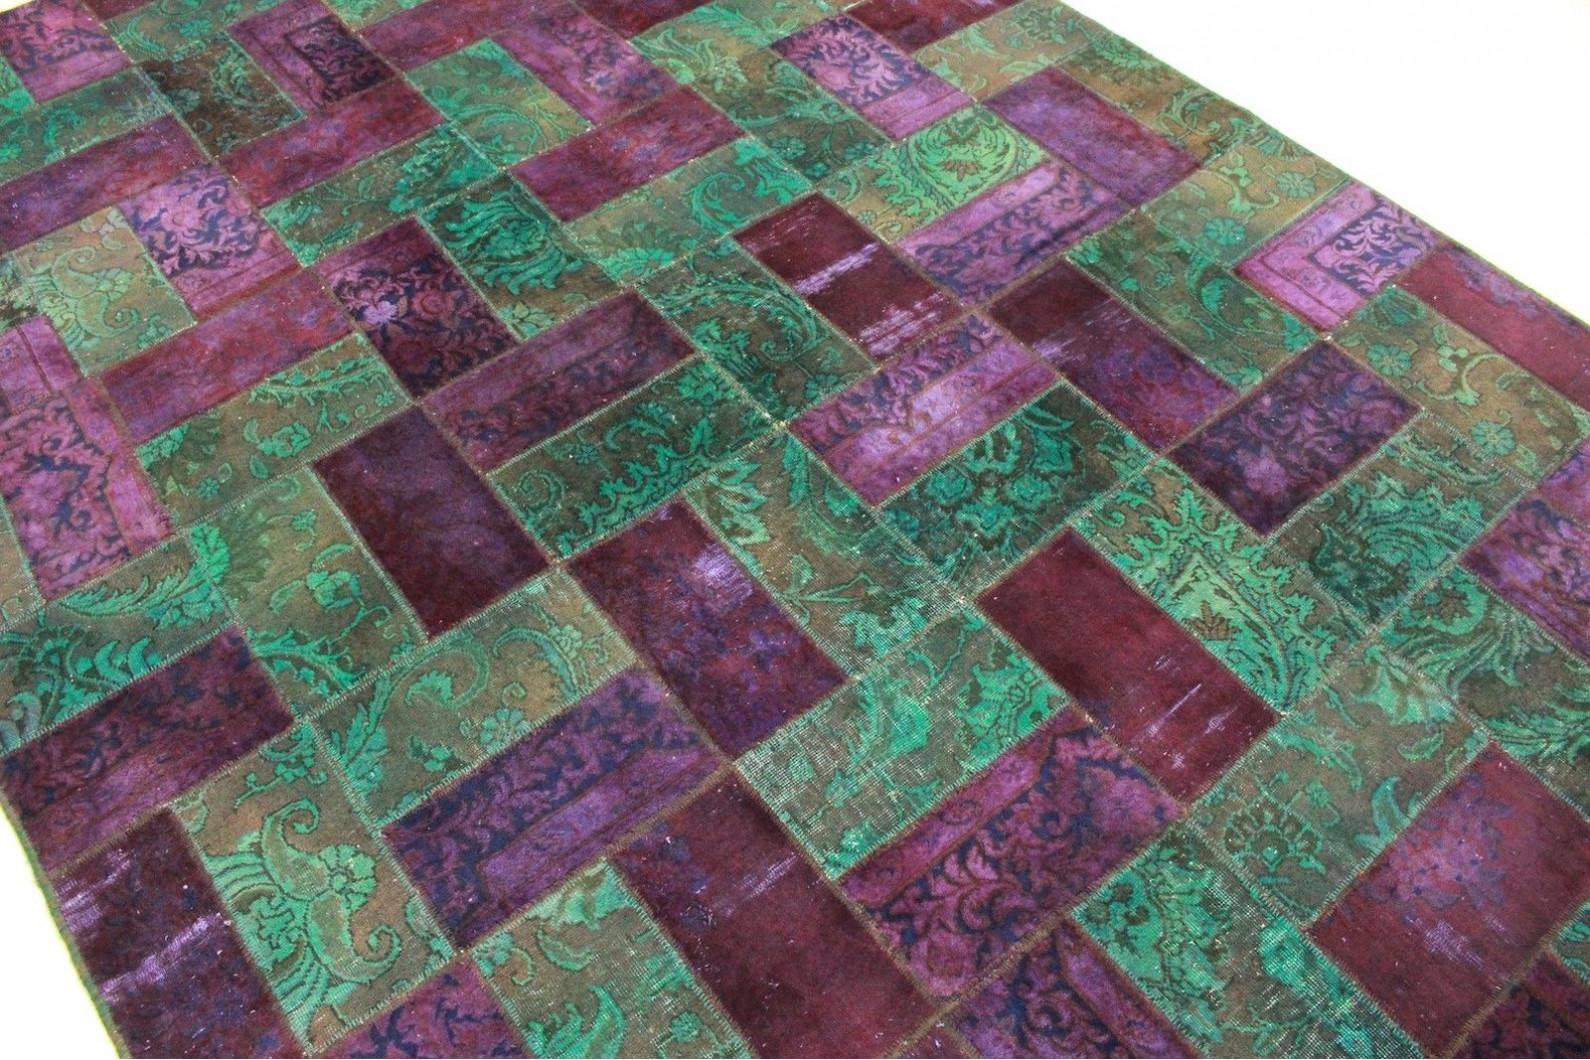 teppich violett latest vintage teppich lila in xcm with teppich violett patchwork teppich lila. Black Bedroom Furniture Sets. Home Design Ideas